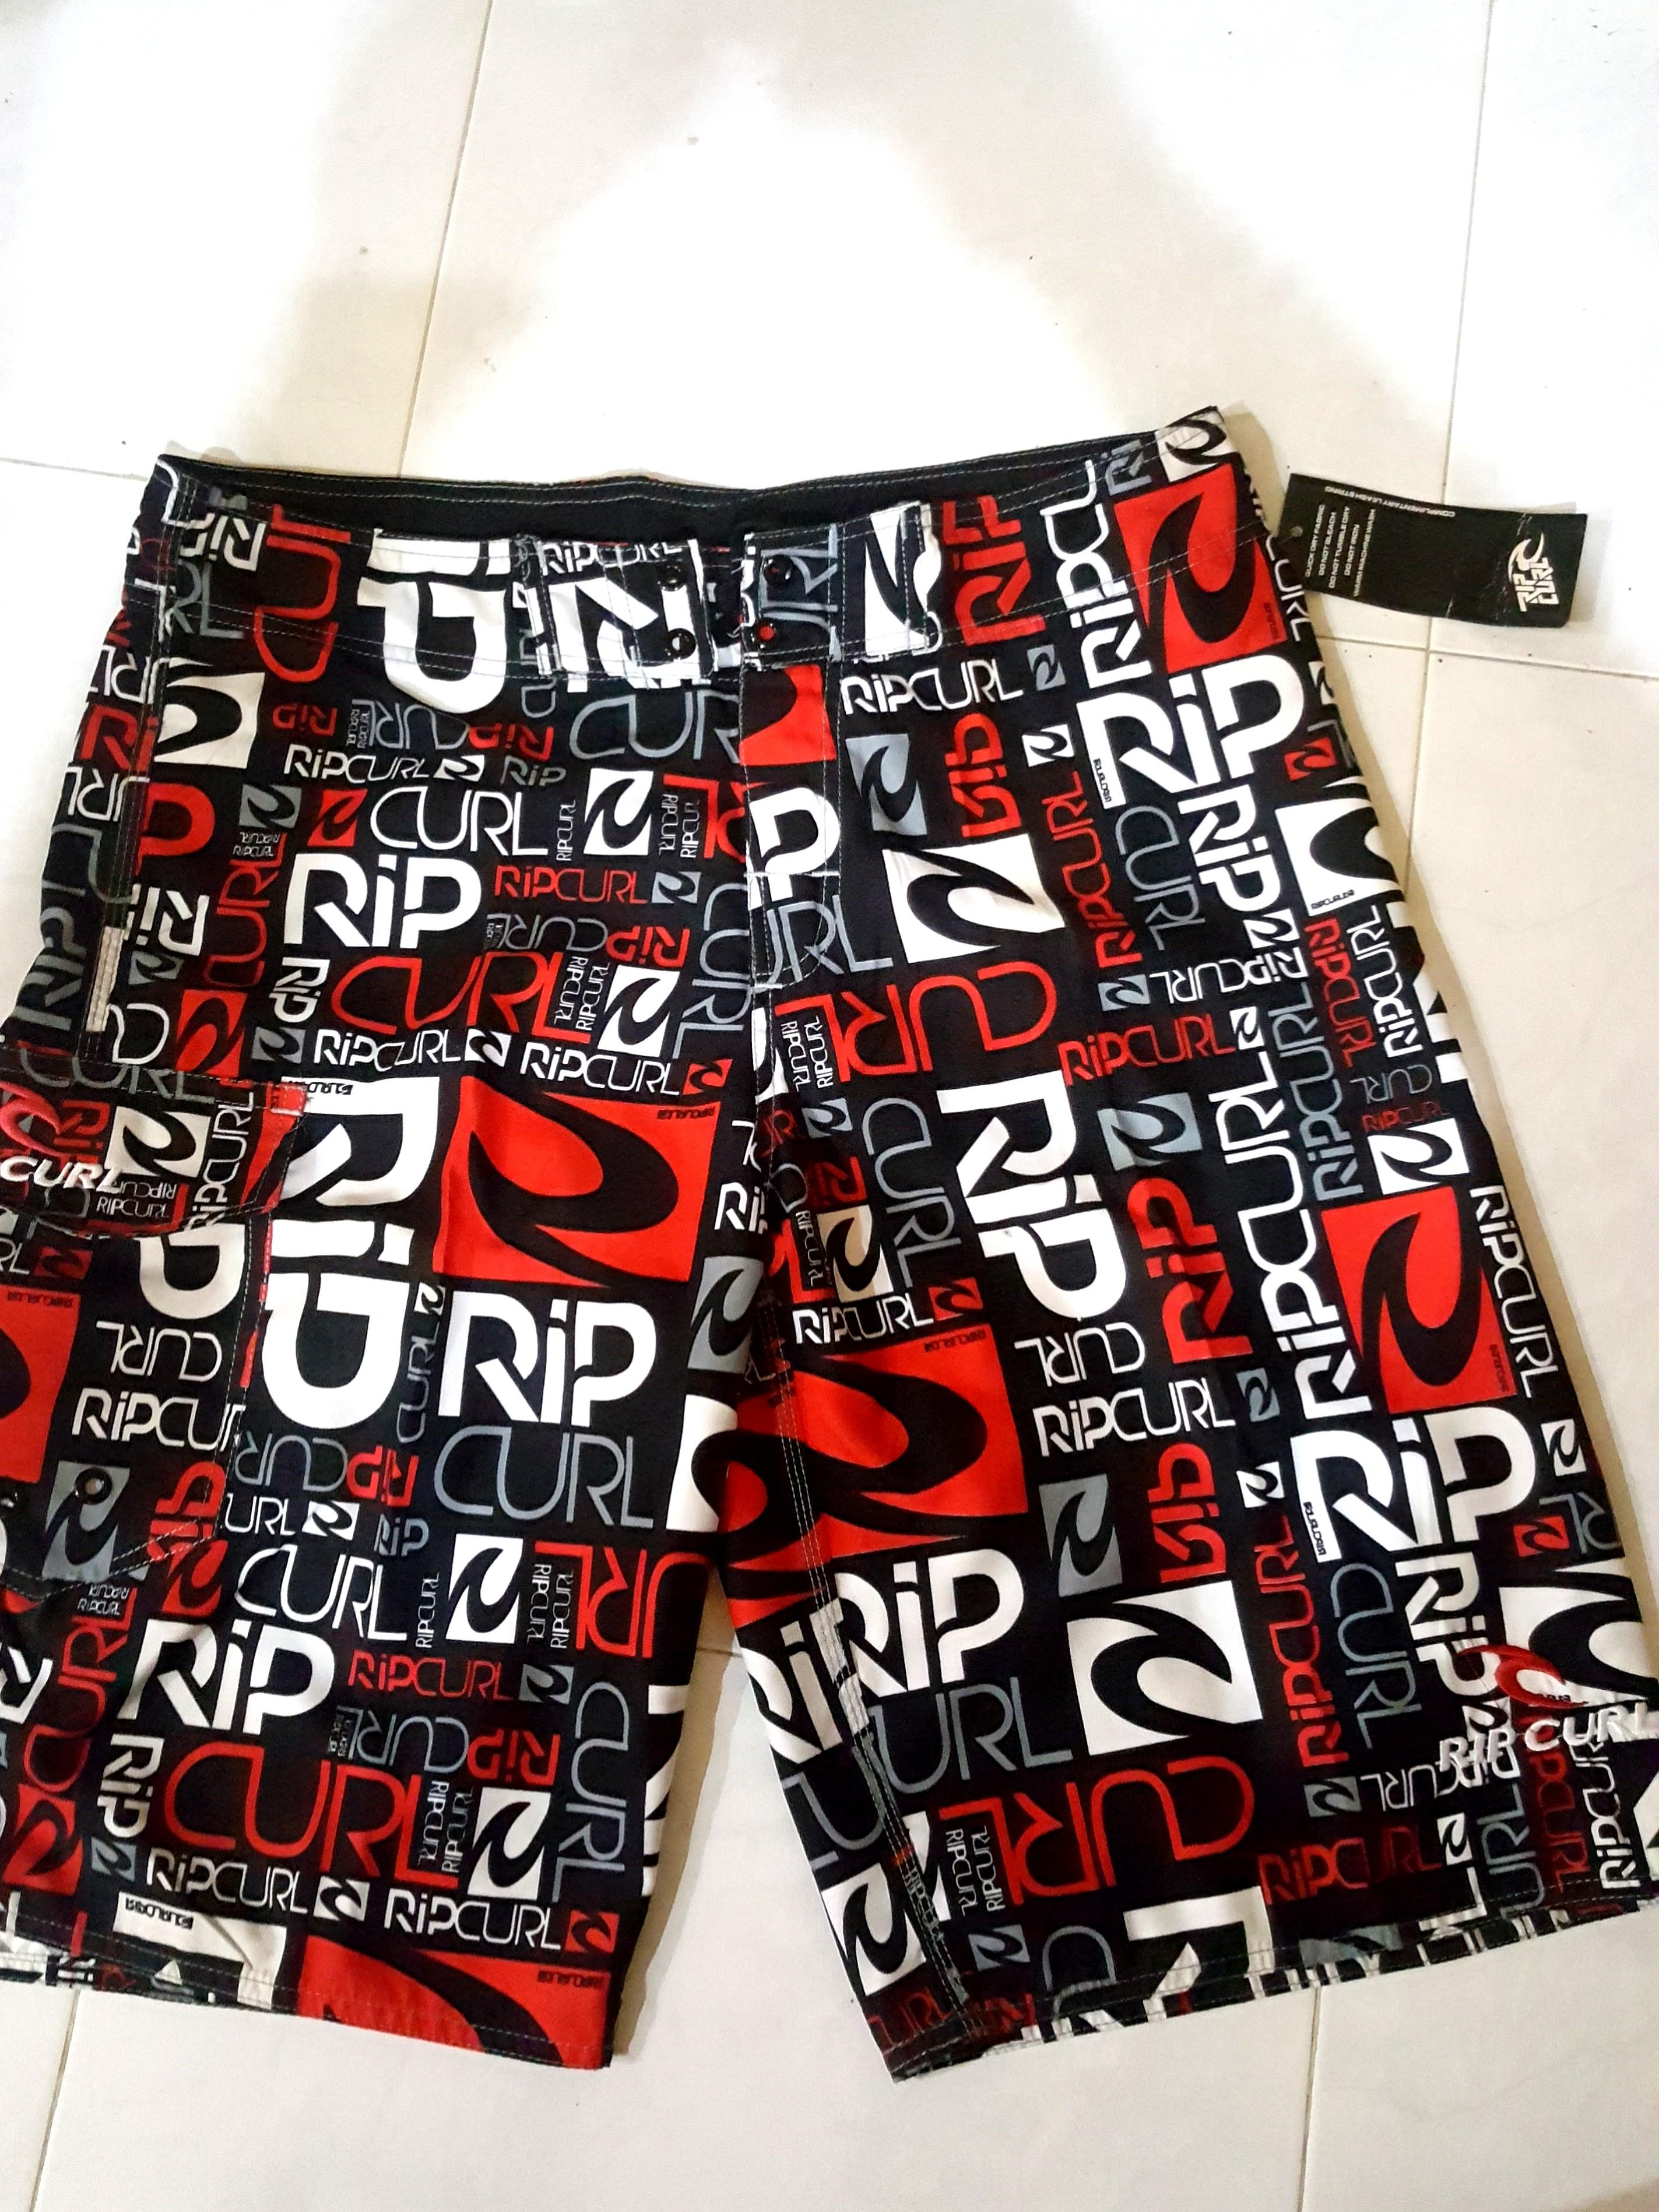 78909d0cc3 BNWT Ripcurl boardshort size 38, Men's Fashion, Clothes, Bottoms on ...